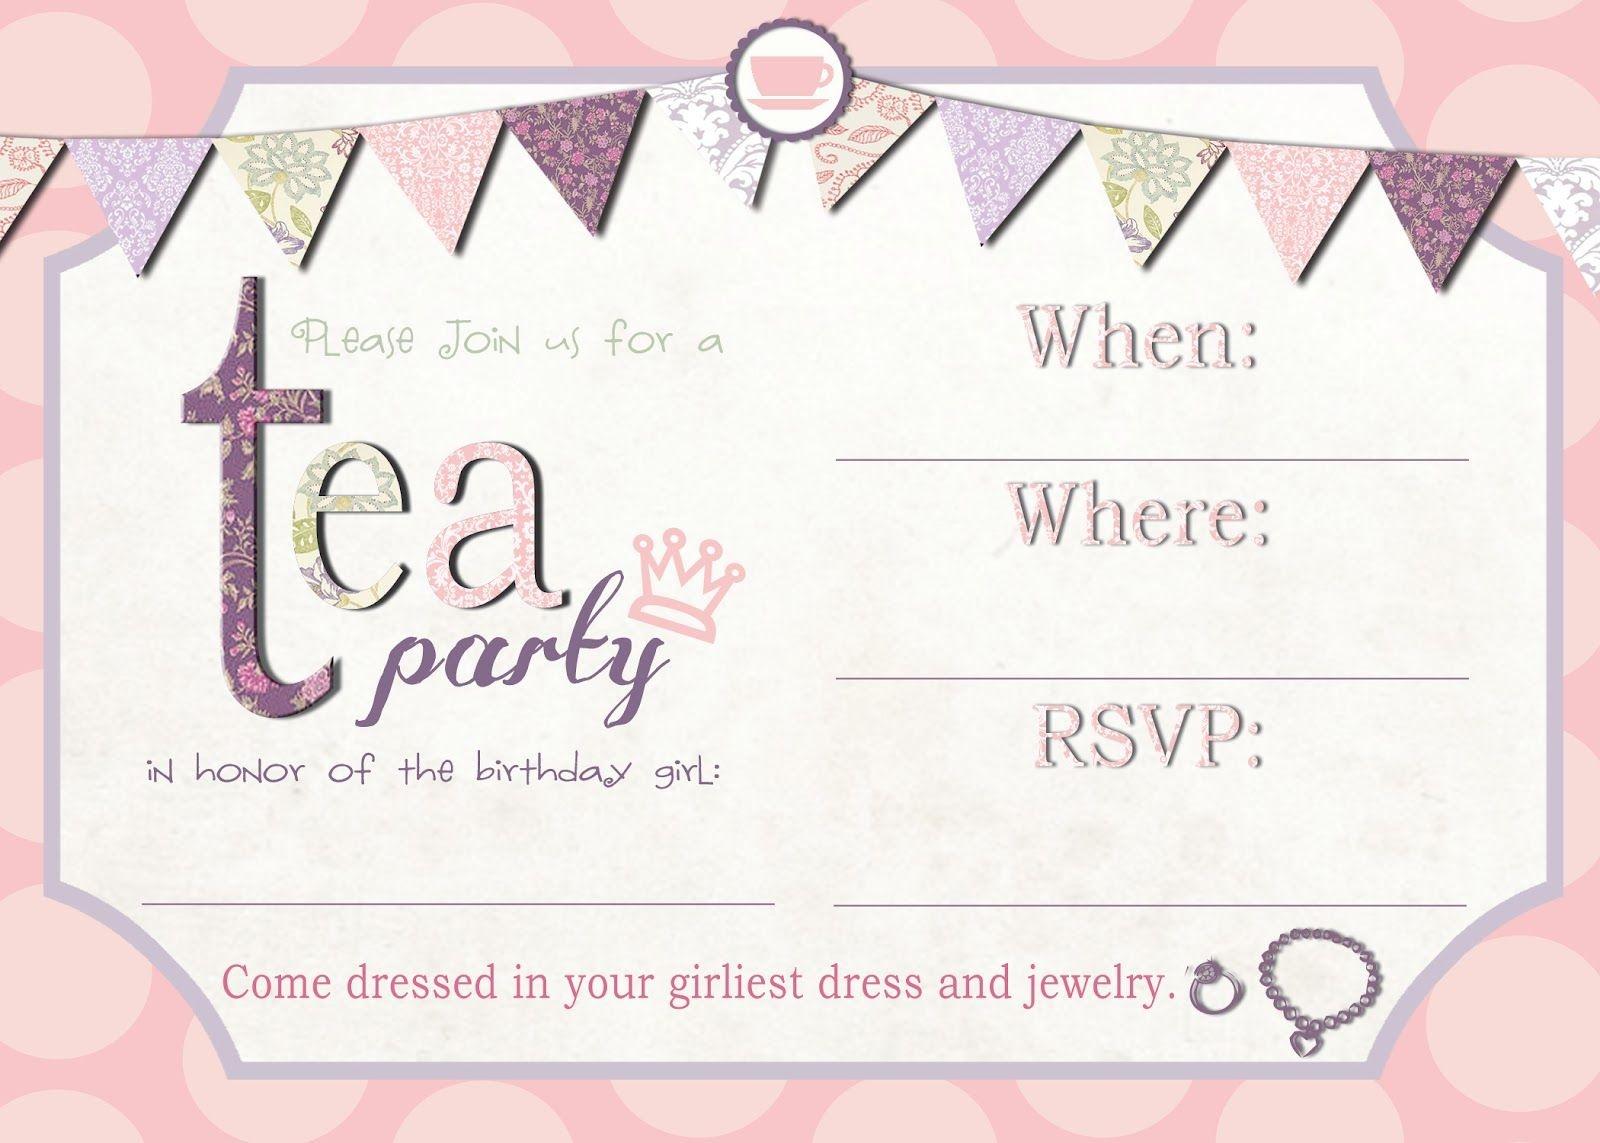 Free Printable Tea Party Invitation Template | Tea Party In 2019 - Free Printable Kitchen Tea Invitation Templates